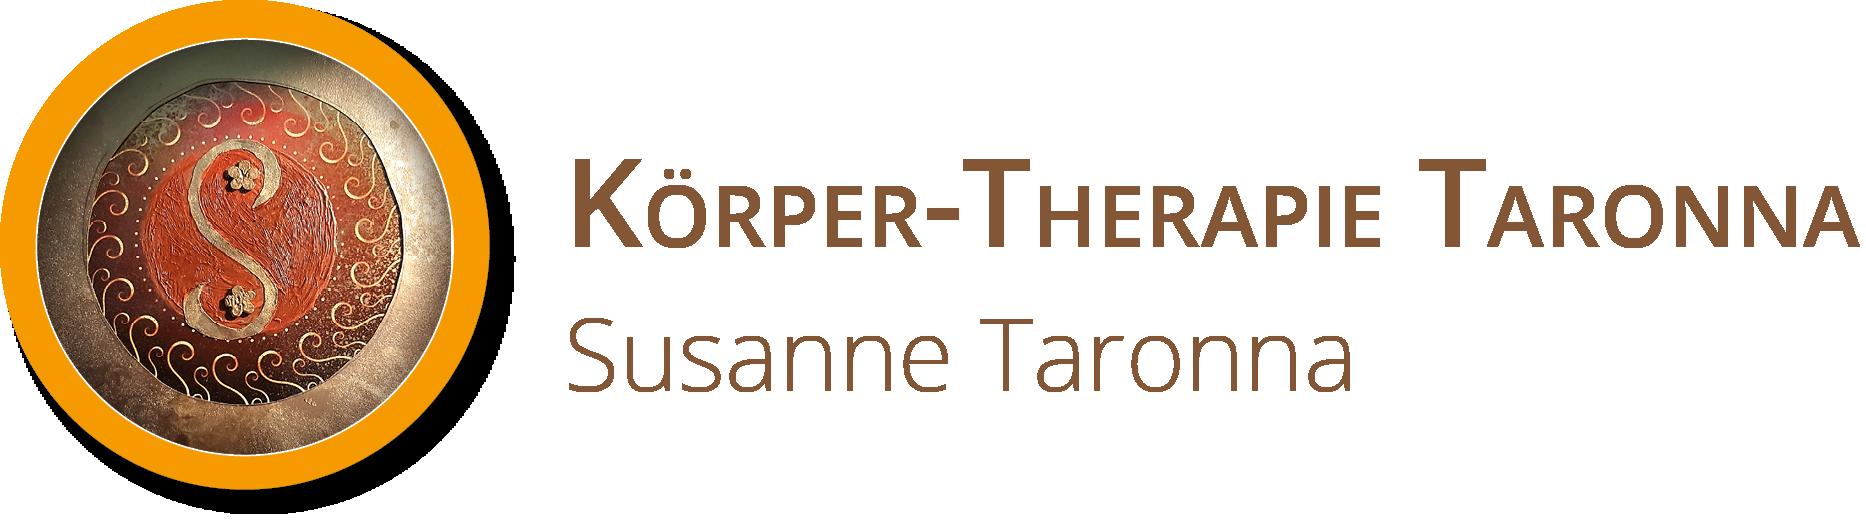 Körper-Therapie Taronna